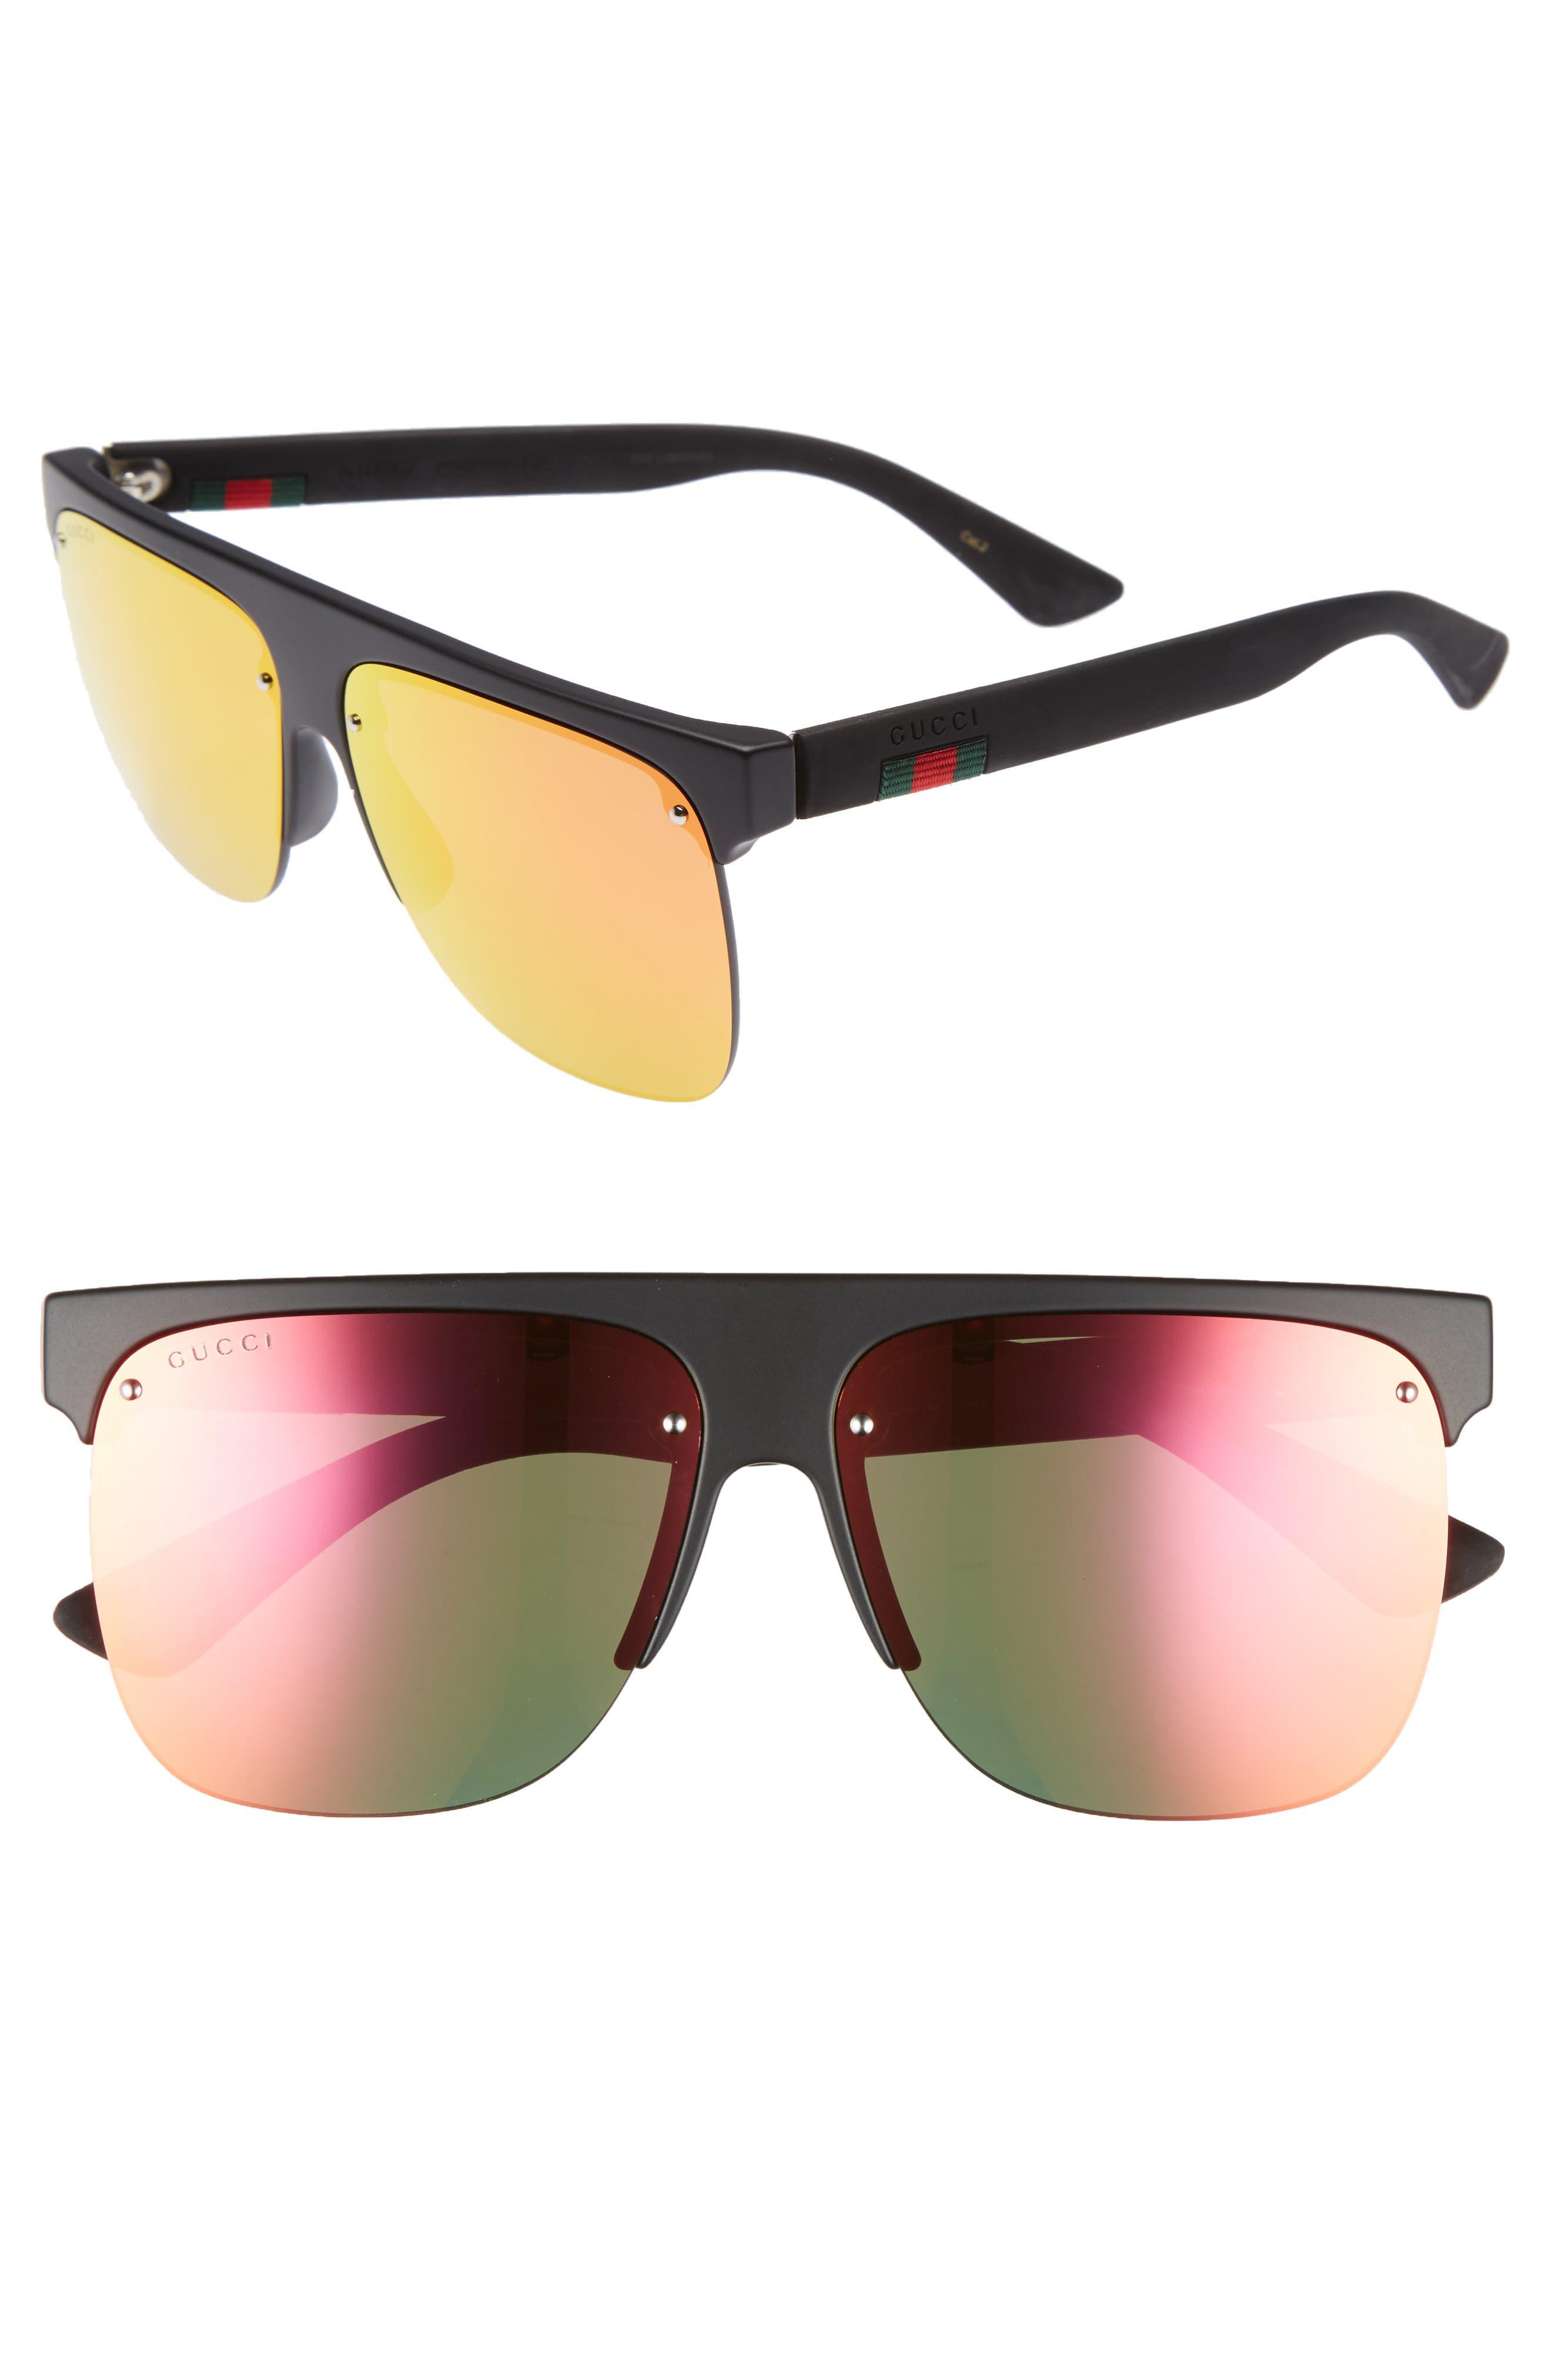 60mm Semi Rimless Polarized Sunglasses,                         Main,                         color,